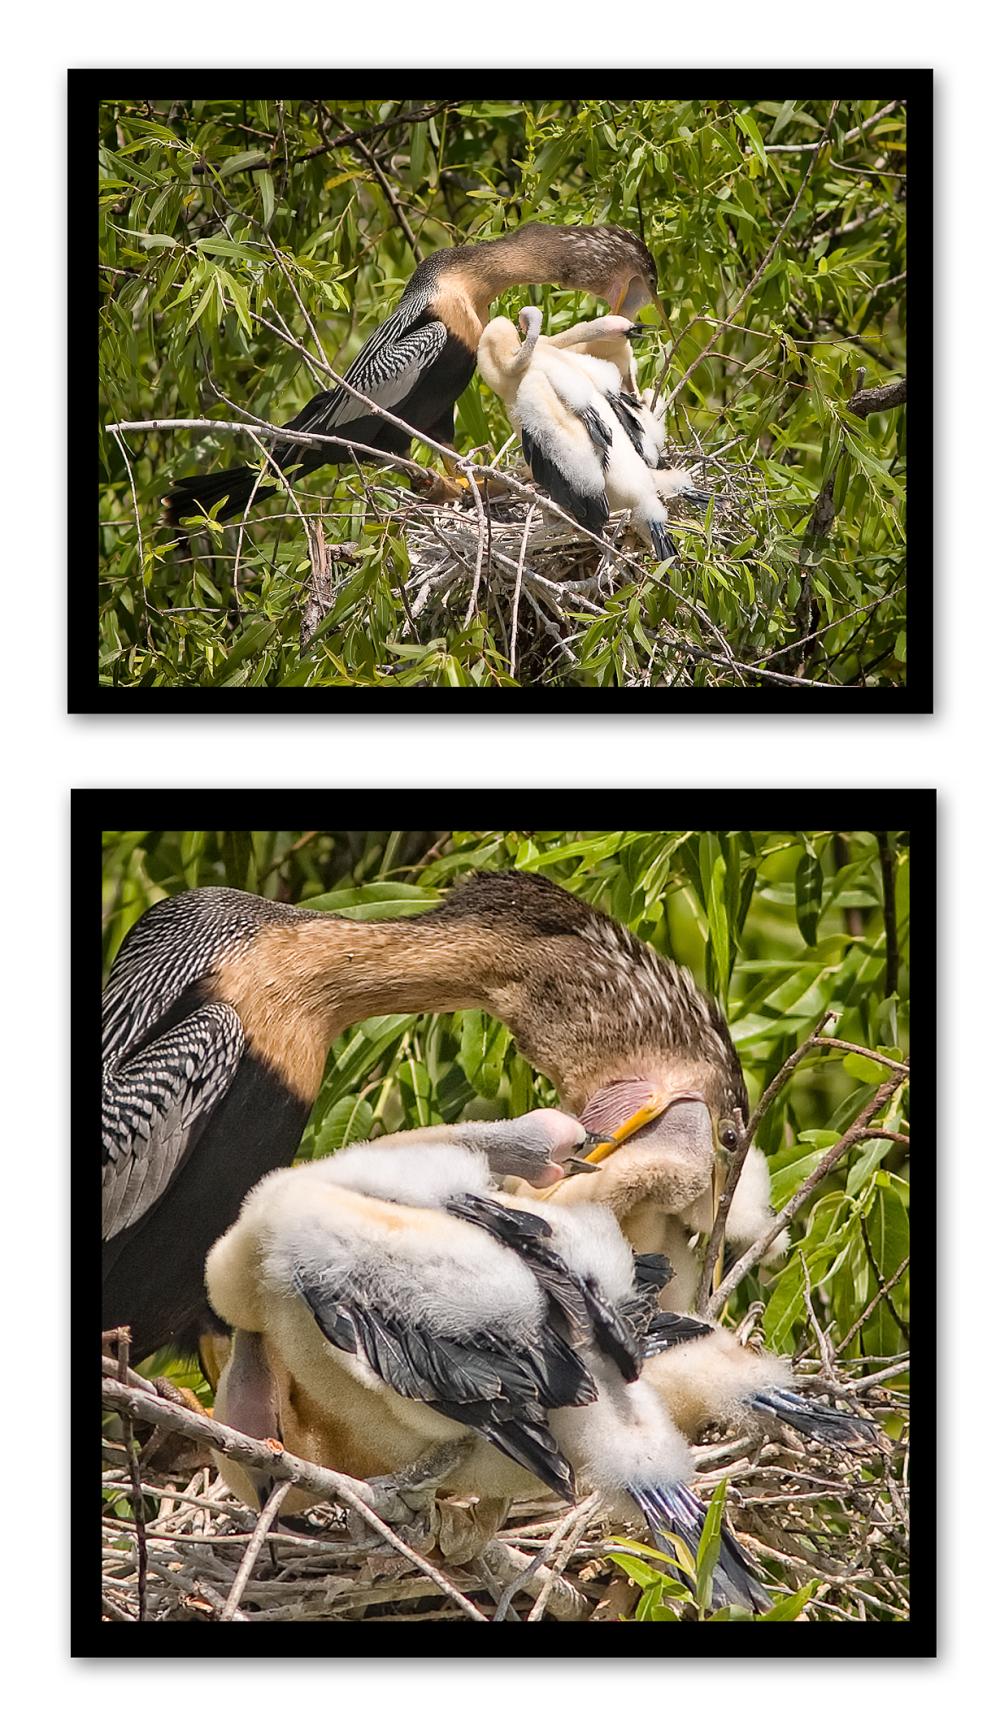 anhinga feeding chicks nest shark valley everglade